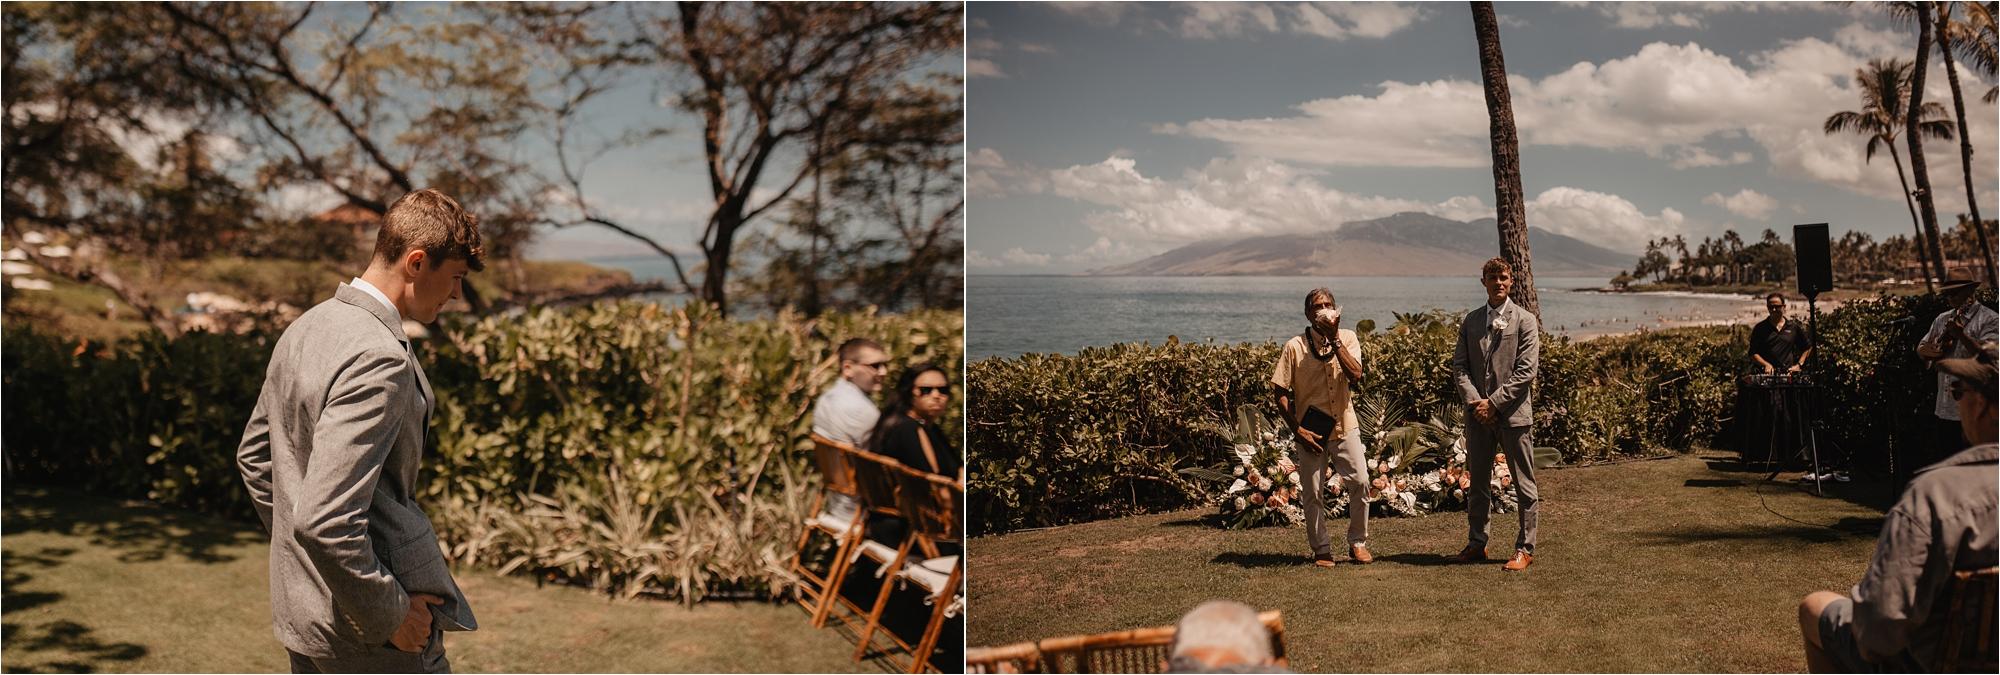 maui-hawaii-intimate-tropical-wedding_0025.jpg